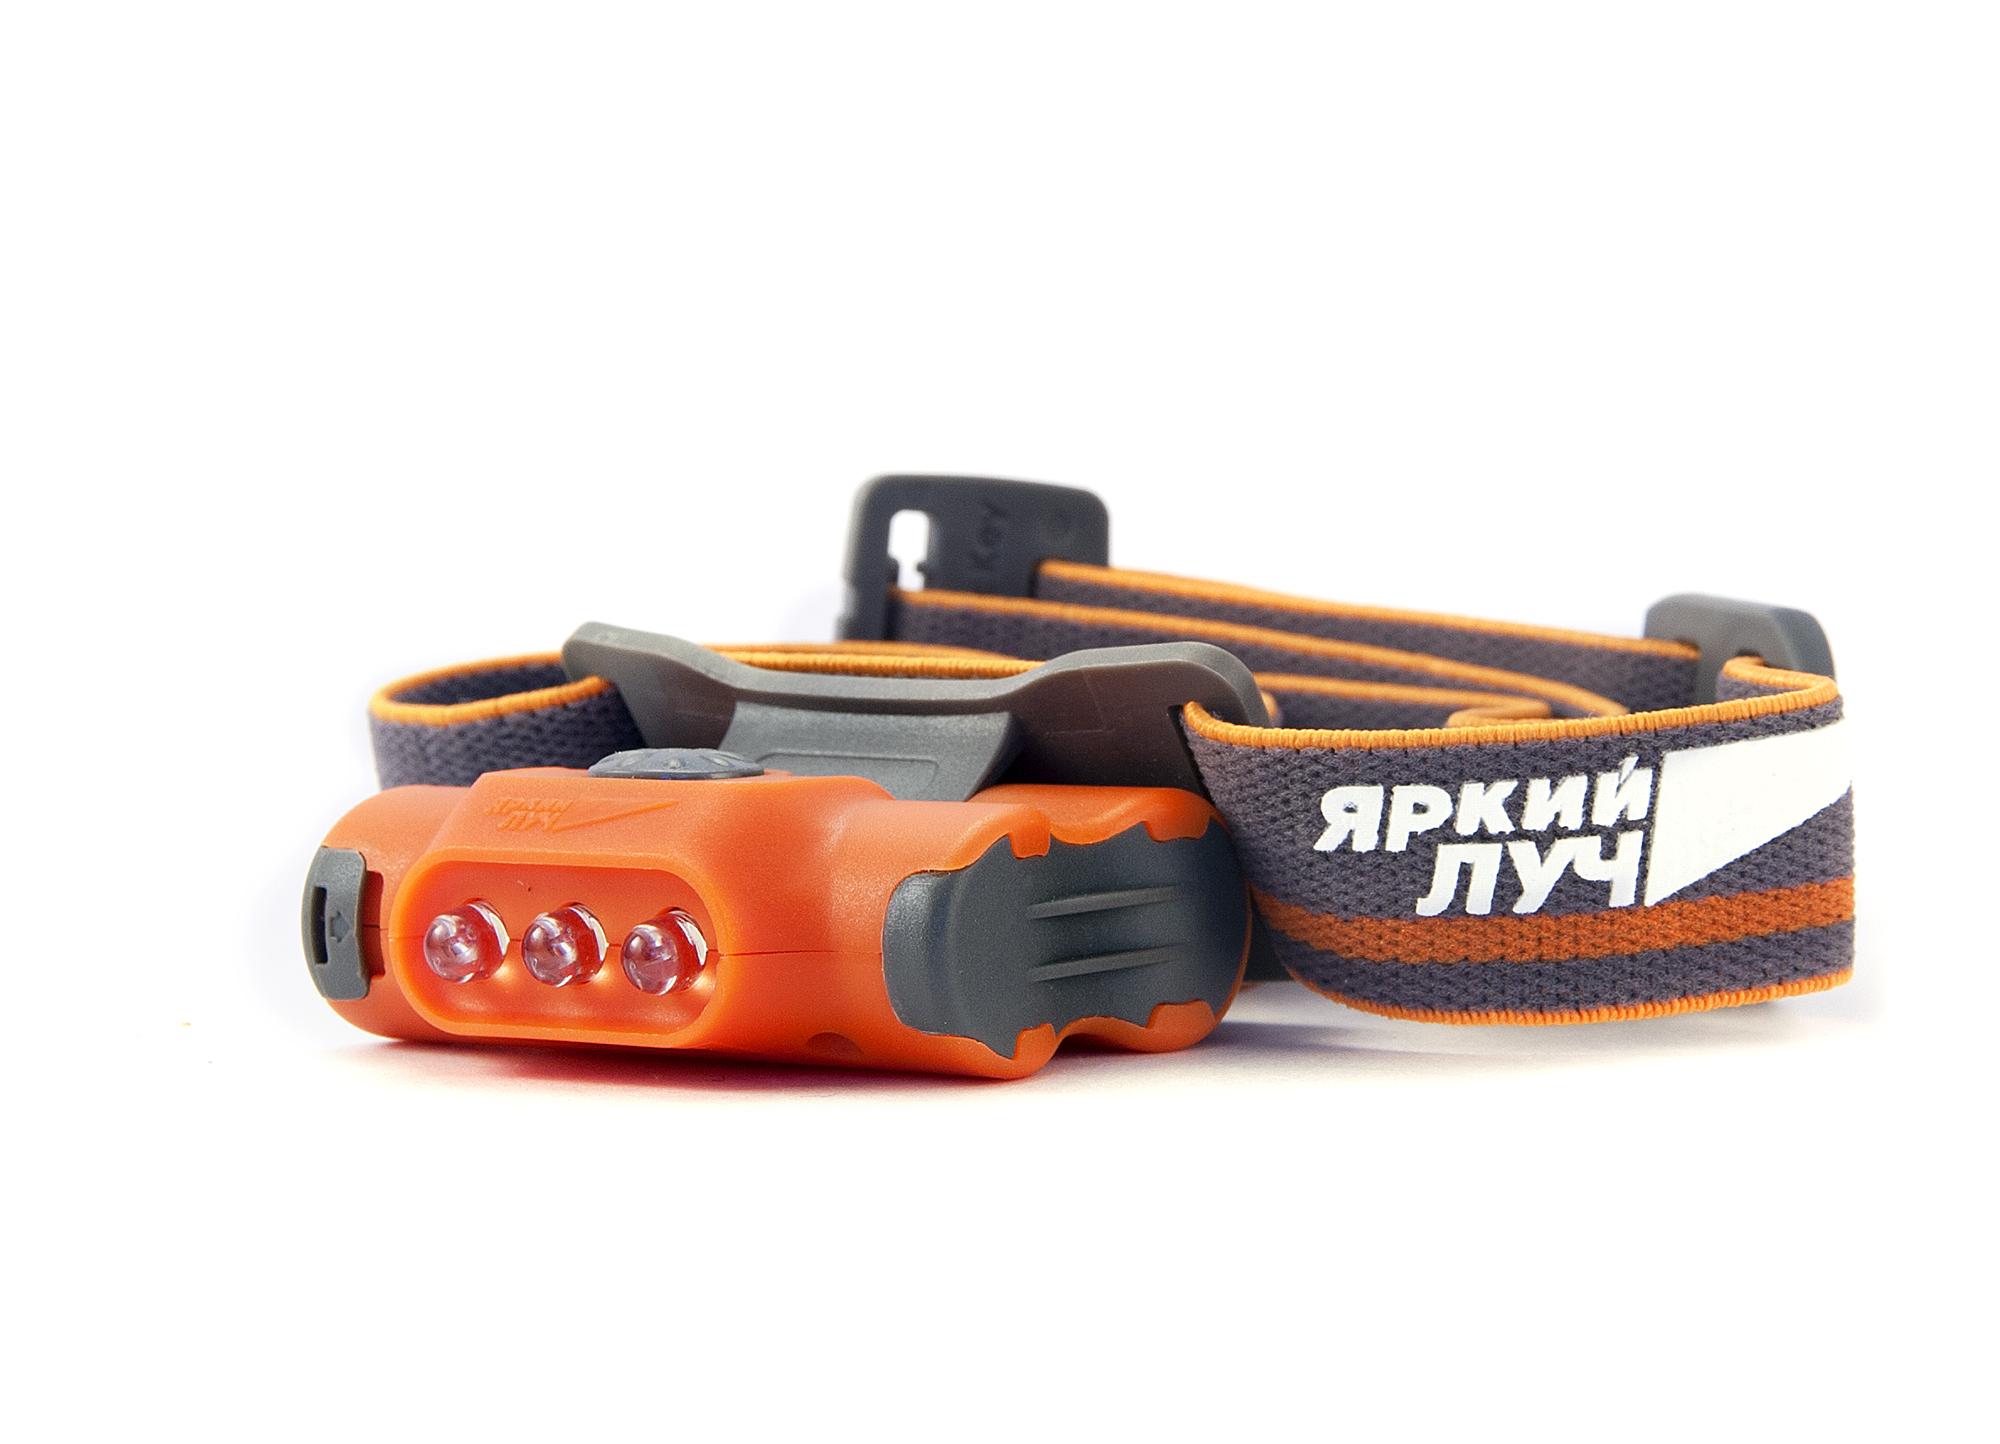 Налобный фонарь ЯРКИЙ ЛУЧ Lh-030 droid оранжевый фонарь налобный яркий луч lh 030 зеленый